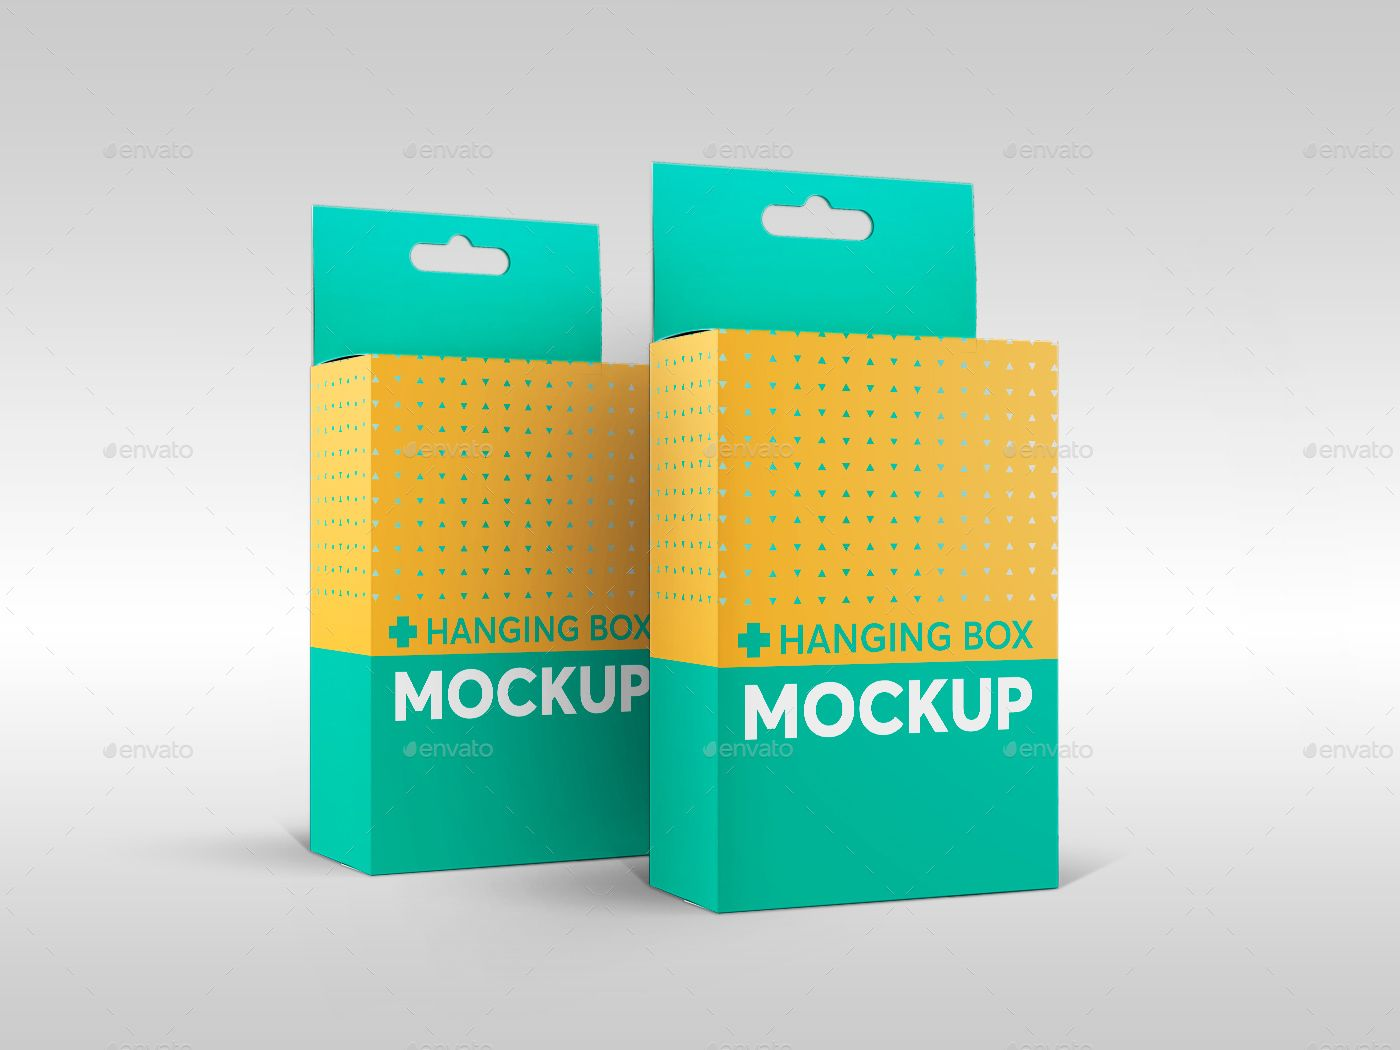 Download Hanging Box Mockups V 1 Hanging Box Mockups Box Mockup Box Packaging Design Mockup